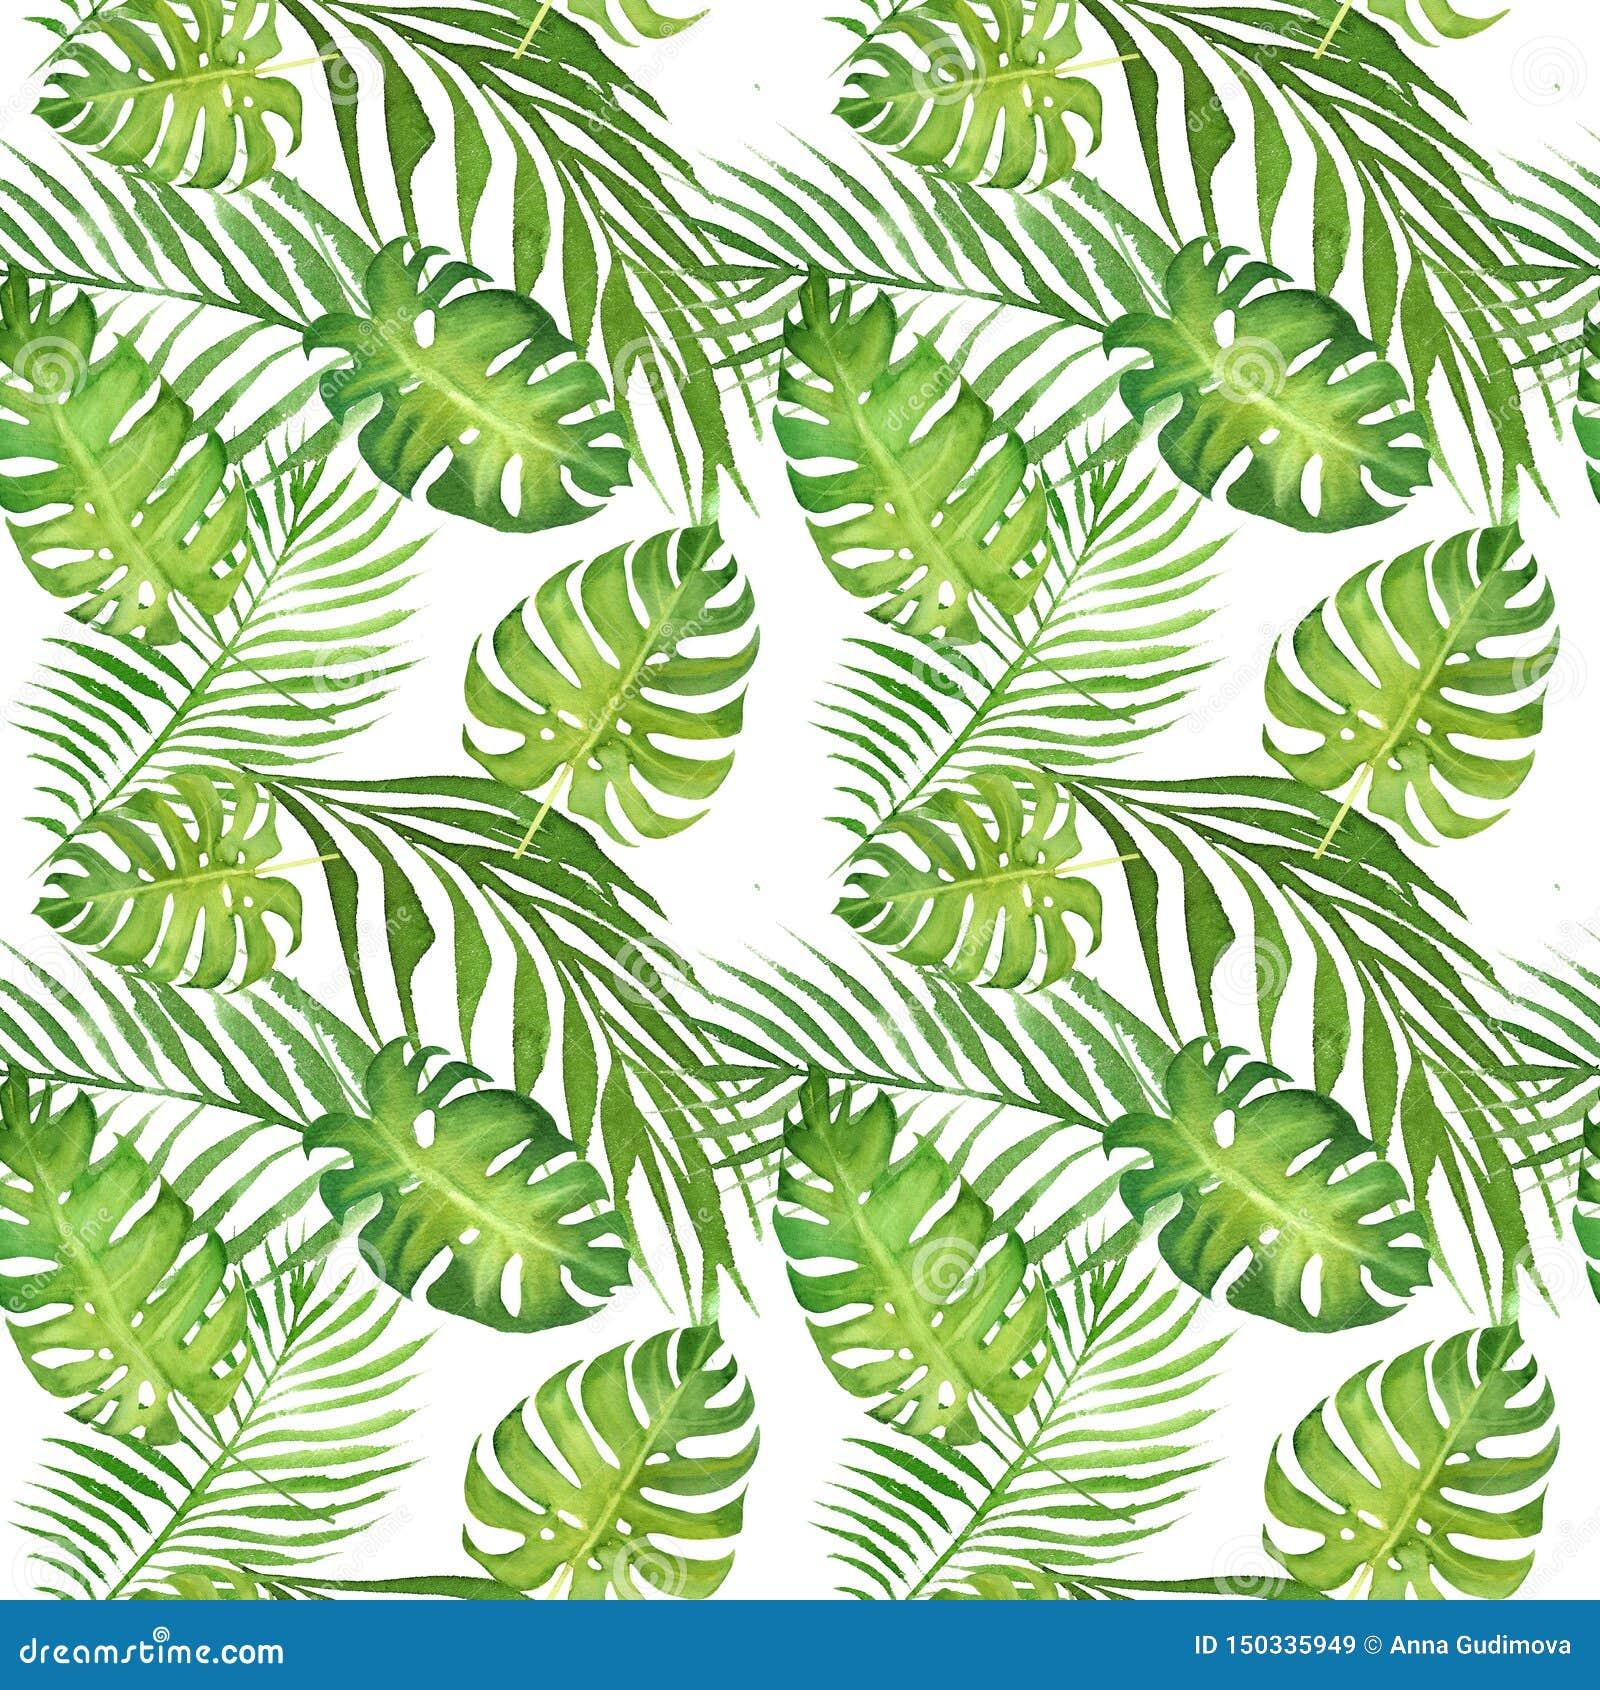 Floral τροπικό άνευ ραφής σχέδιο Watercolor με τα πράσινα φύλλα monstera και τα φύλλα φοινίκων στο λευκό